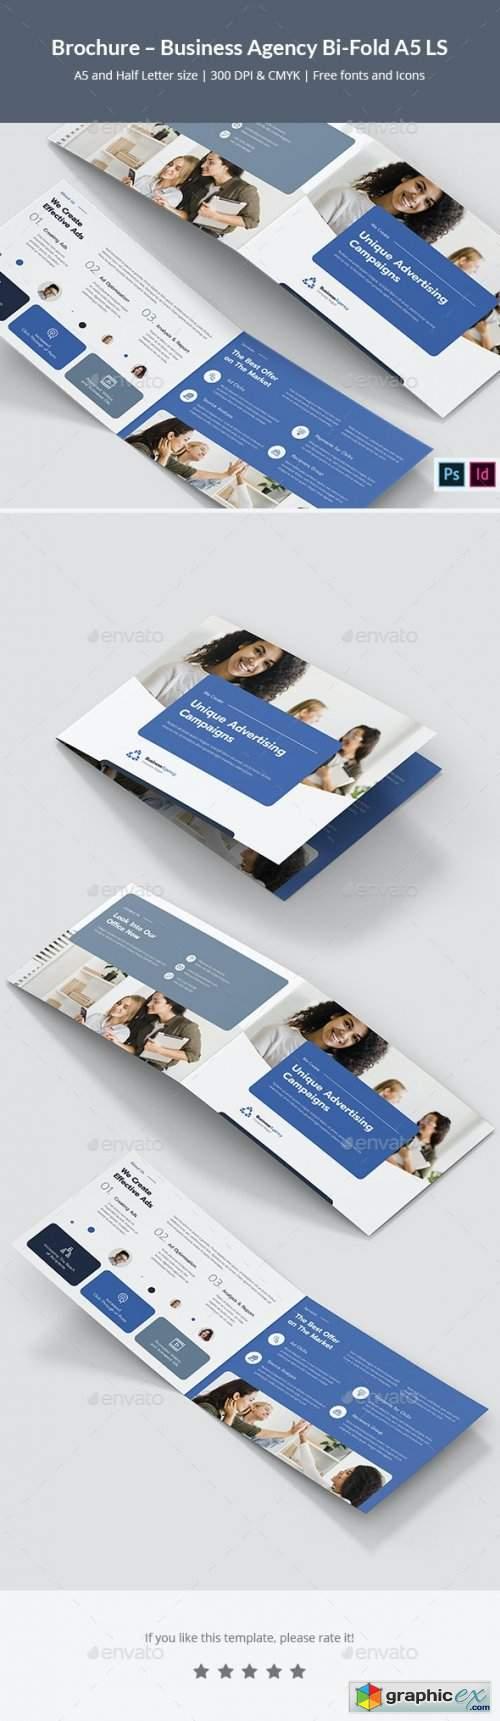 Brochure – Business Agency Bi-Fold A5 Landscape